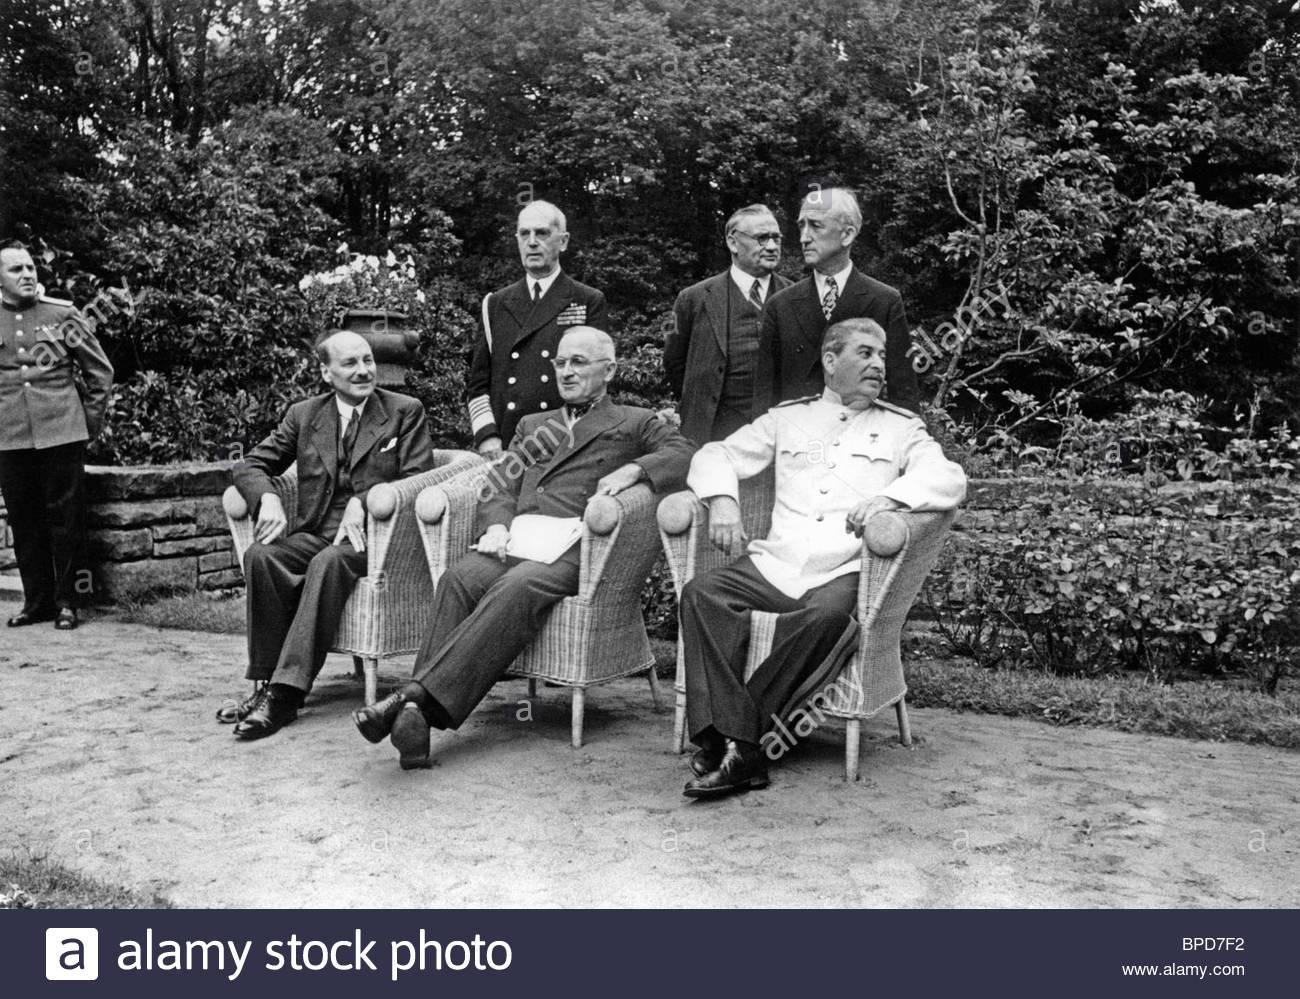 Potsdam conference, 1945 - Stock Image